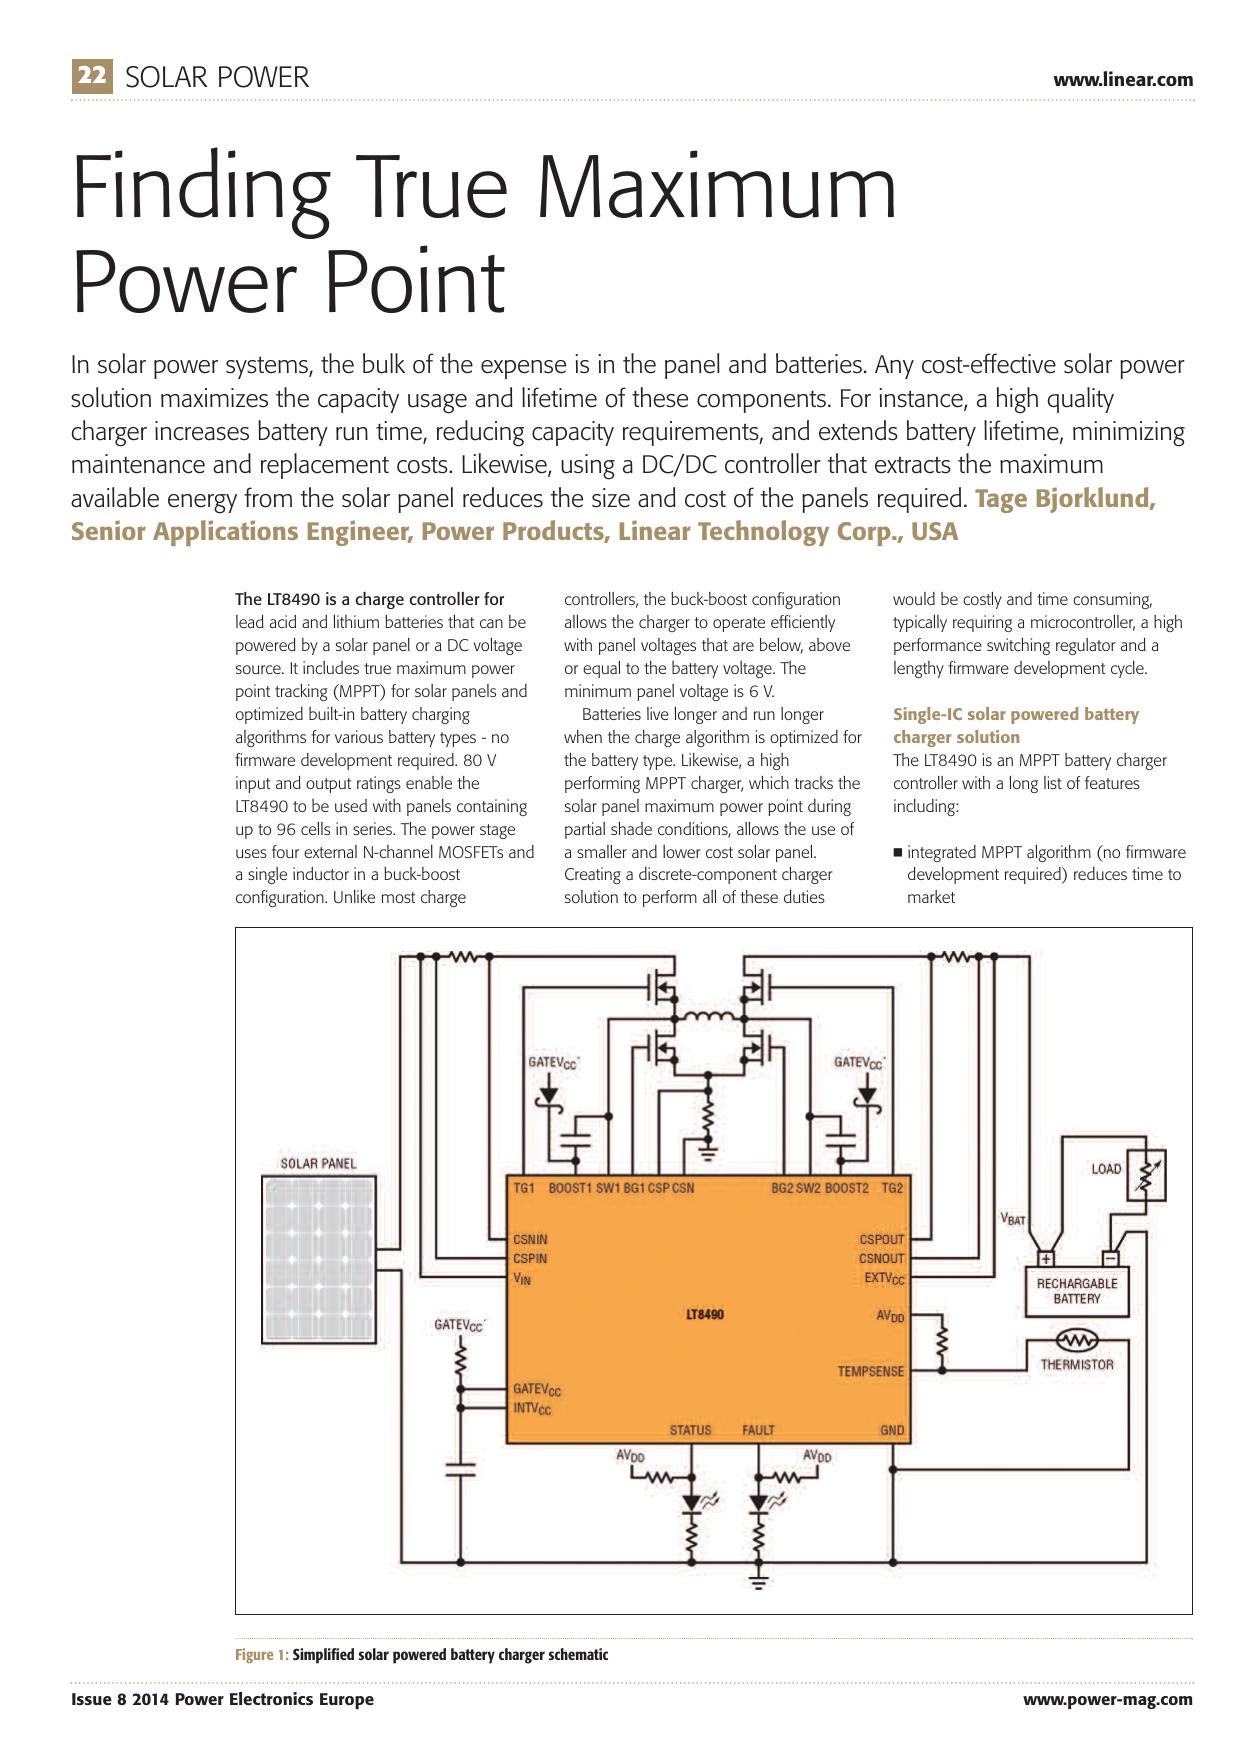 Finding True Maximum Power Point | manualzz com